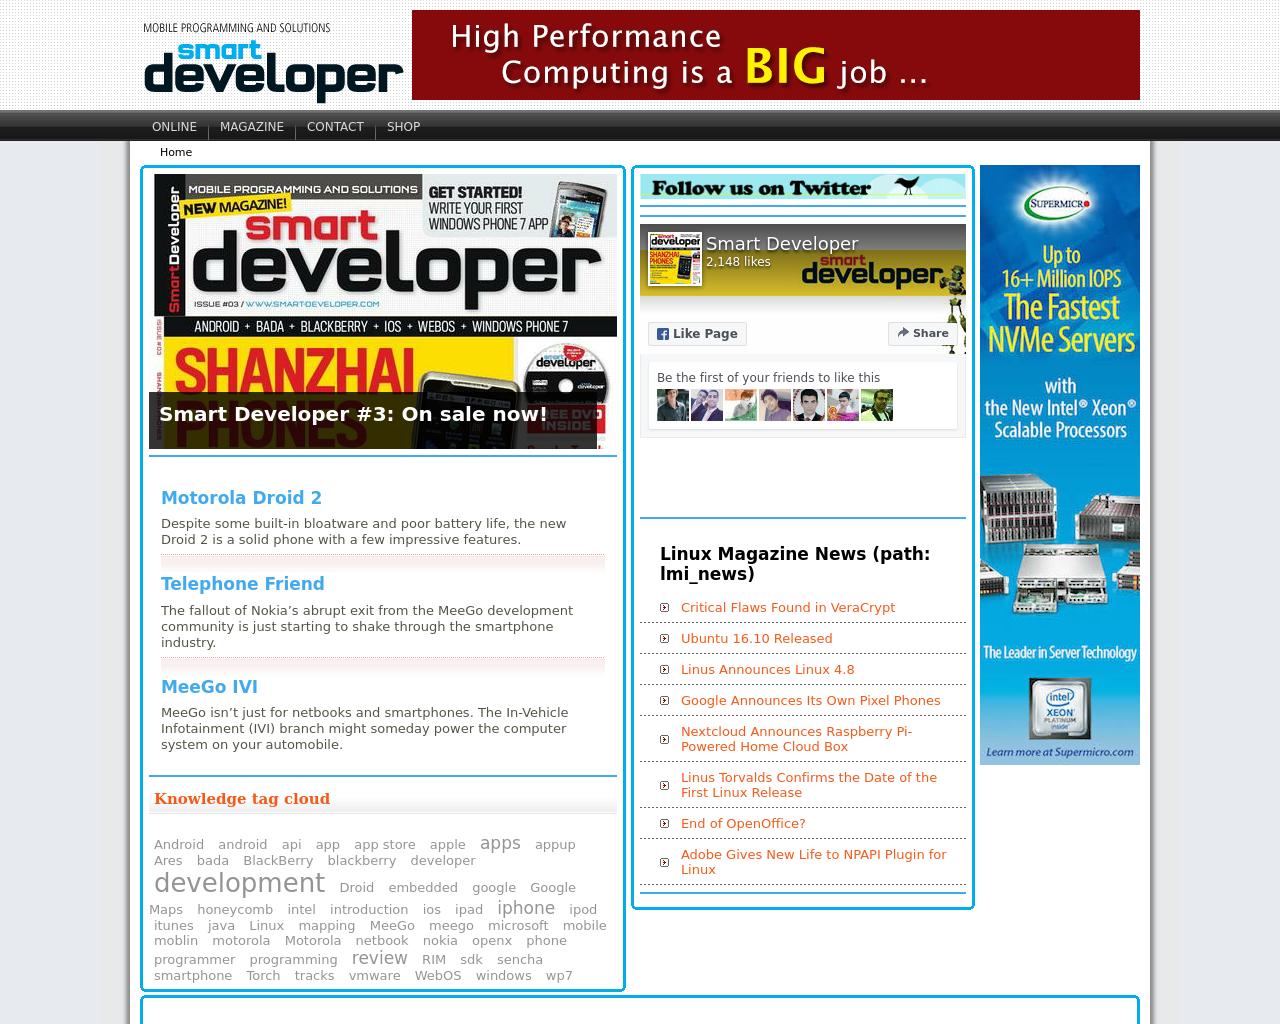 smart-developer-Advertising-Reviews-Pricing